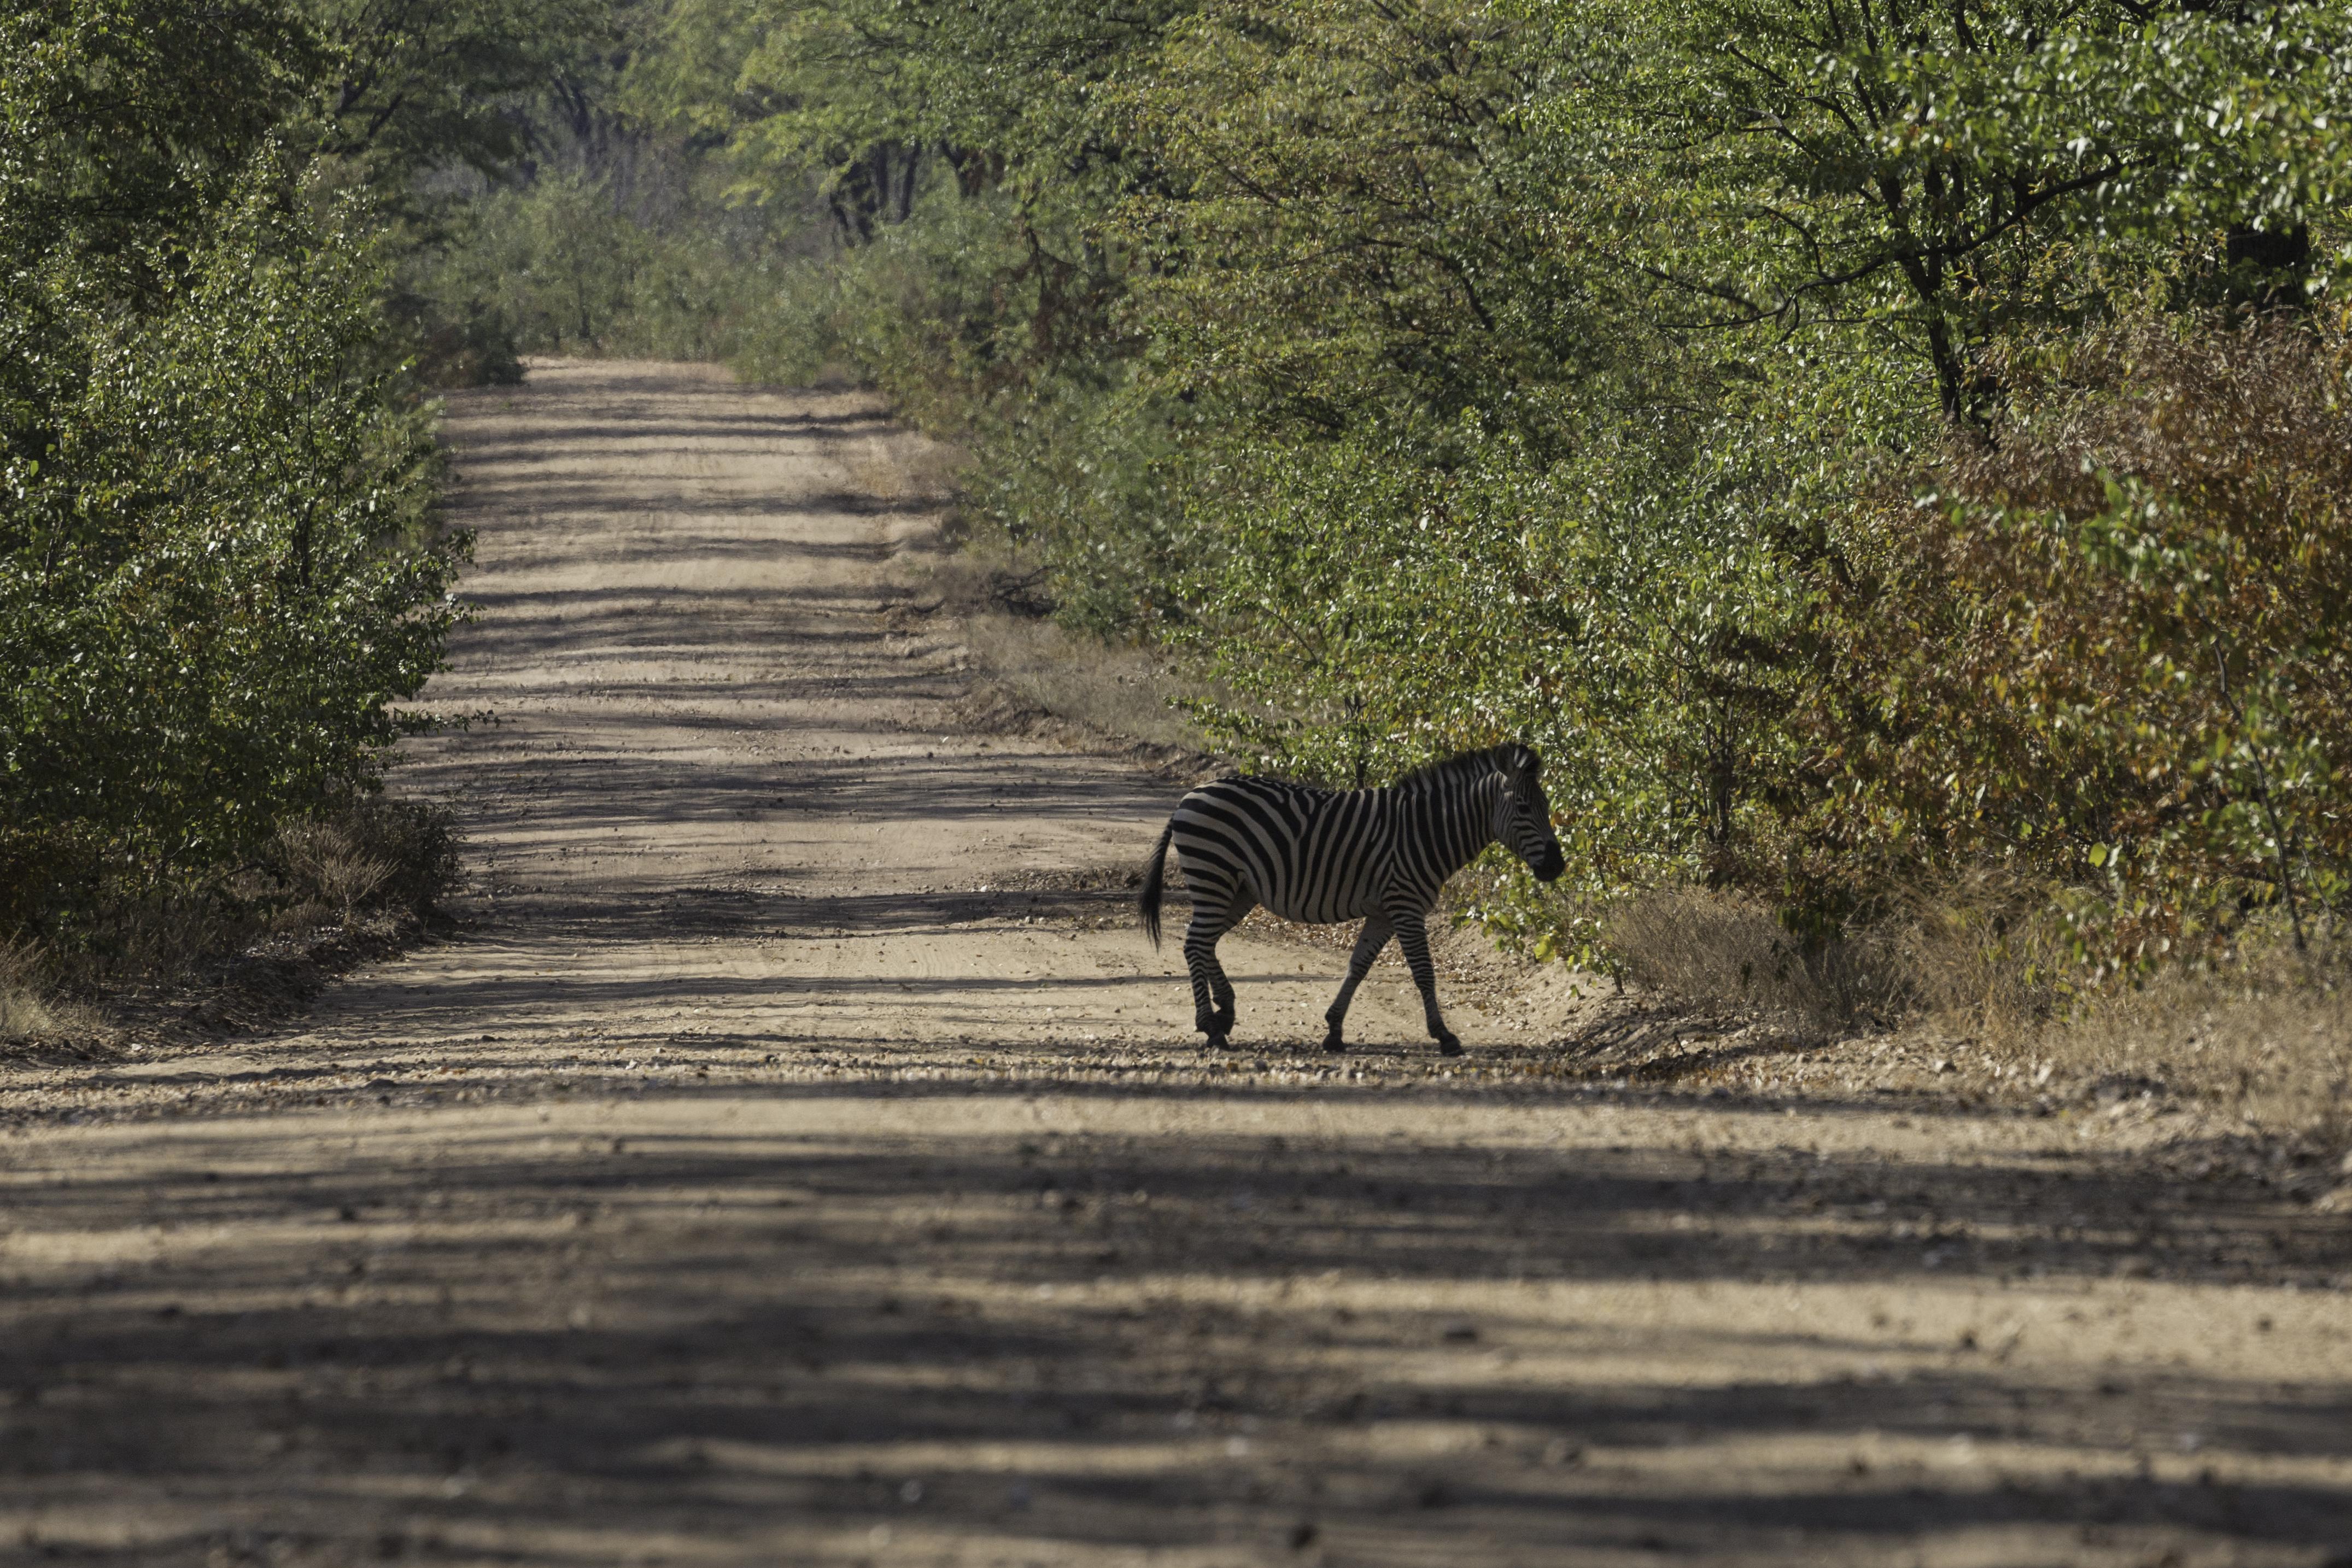 ManaPools Zebra crossing